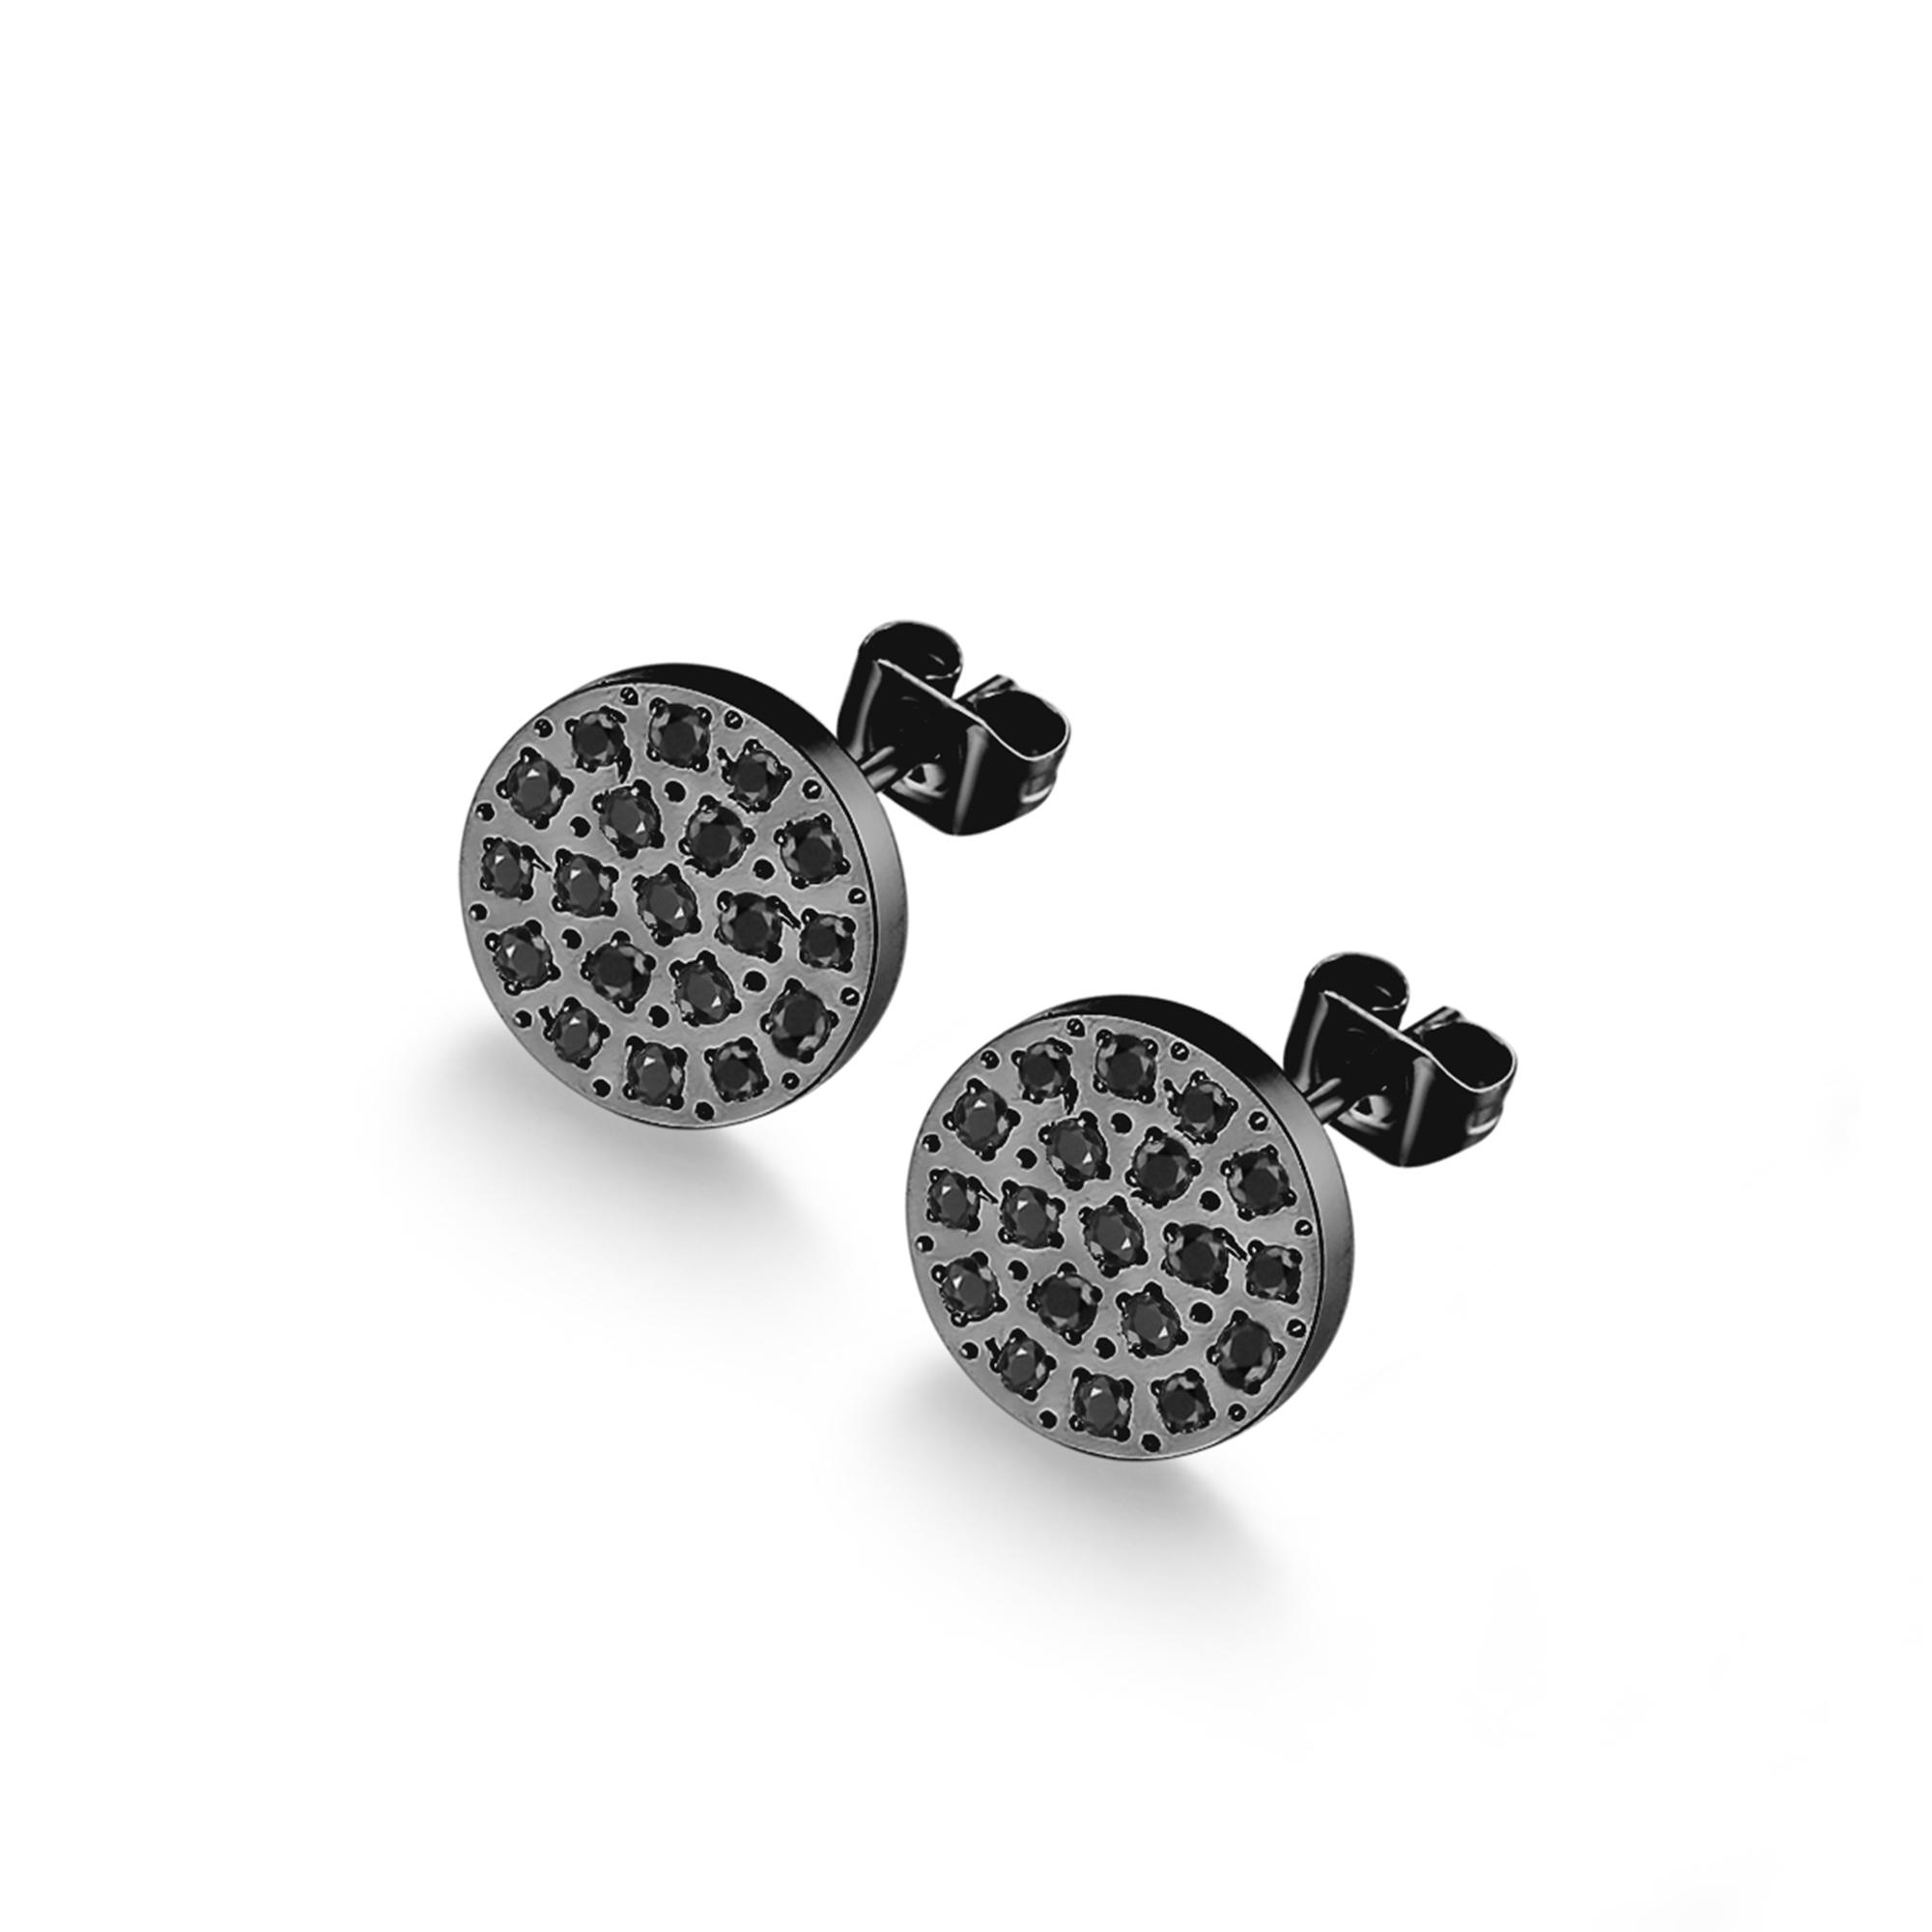 ice diamonds by kranz – Sort stål ørestikker med zirkonia - 1404302 fra brodersen + kobborg